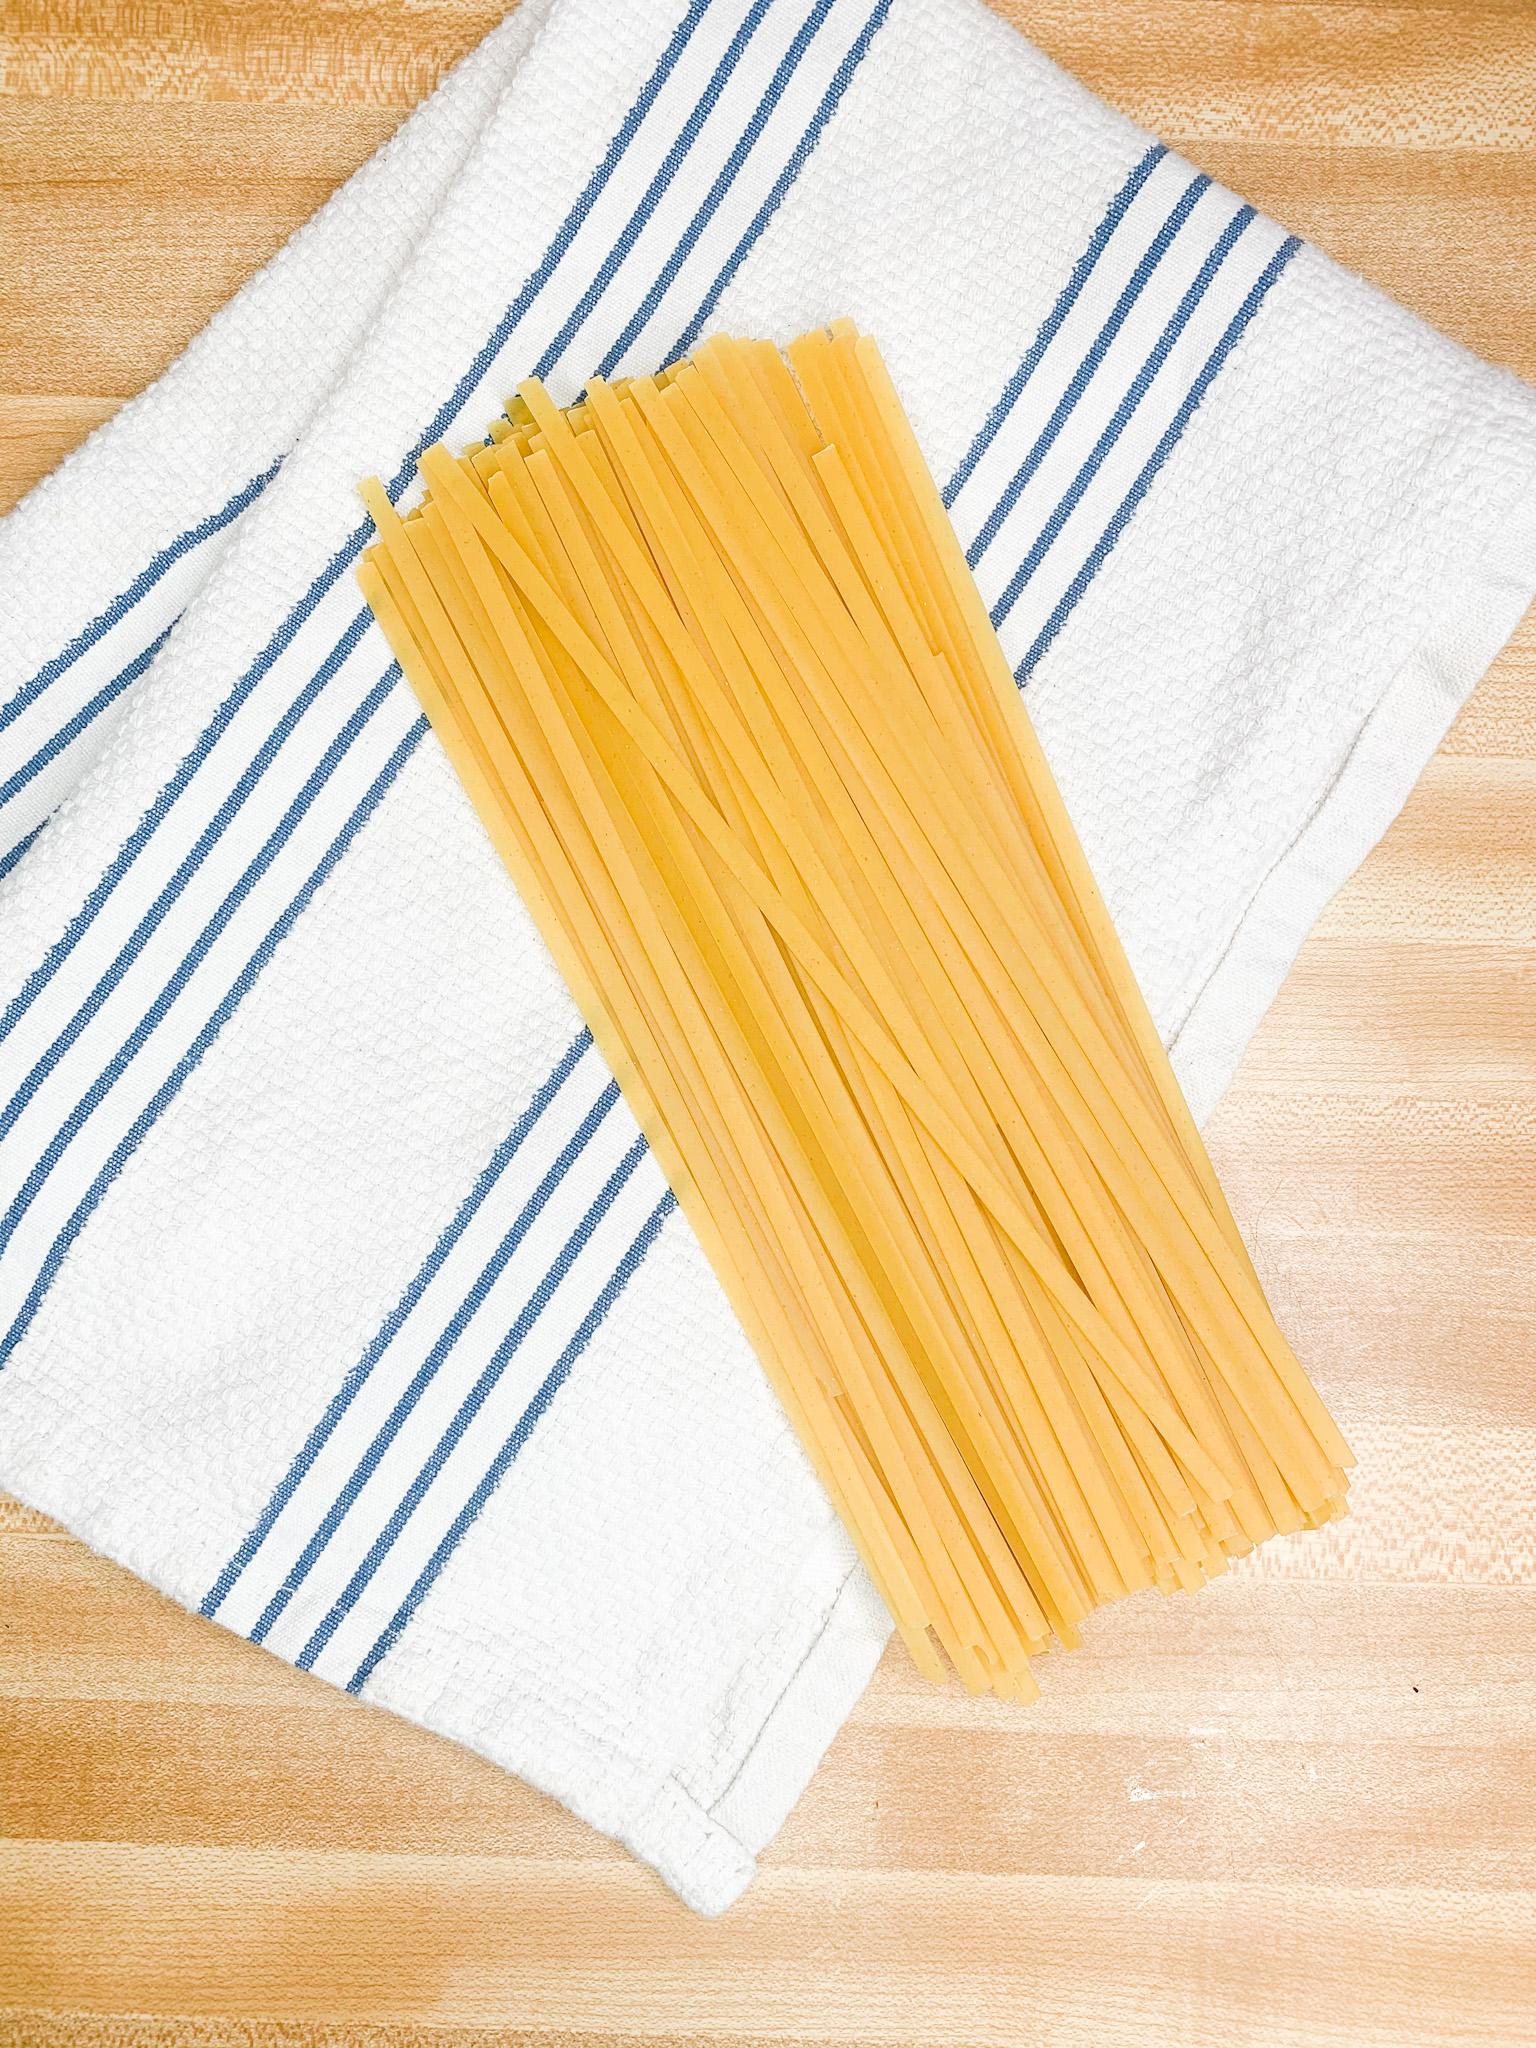 fettuccine noodles on a towel